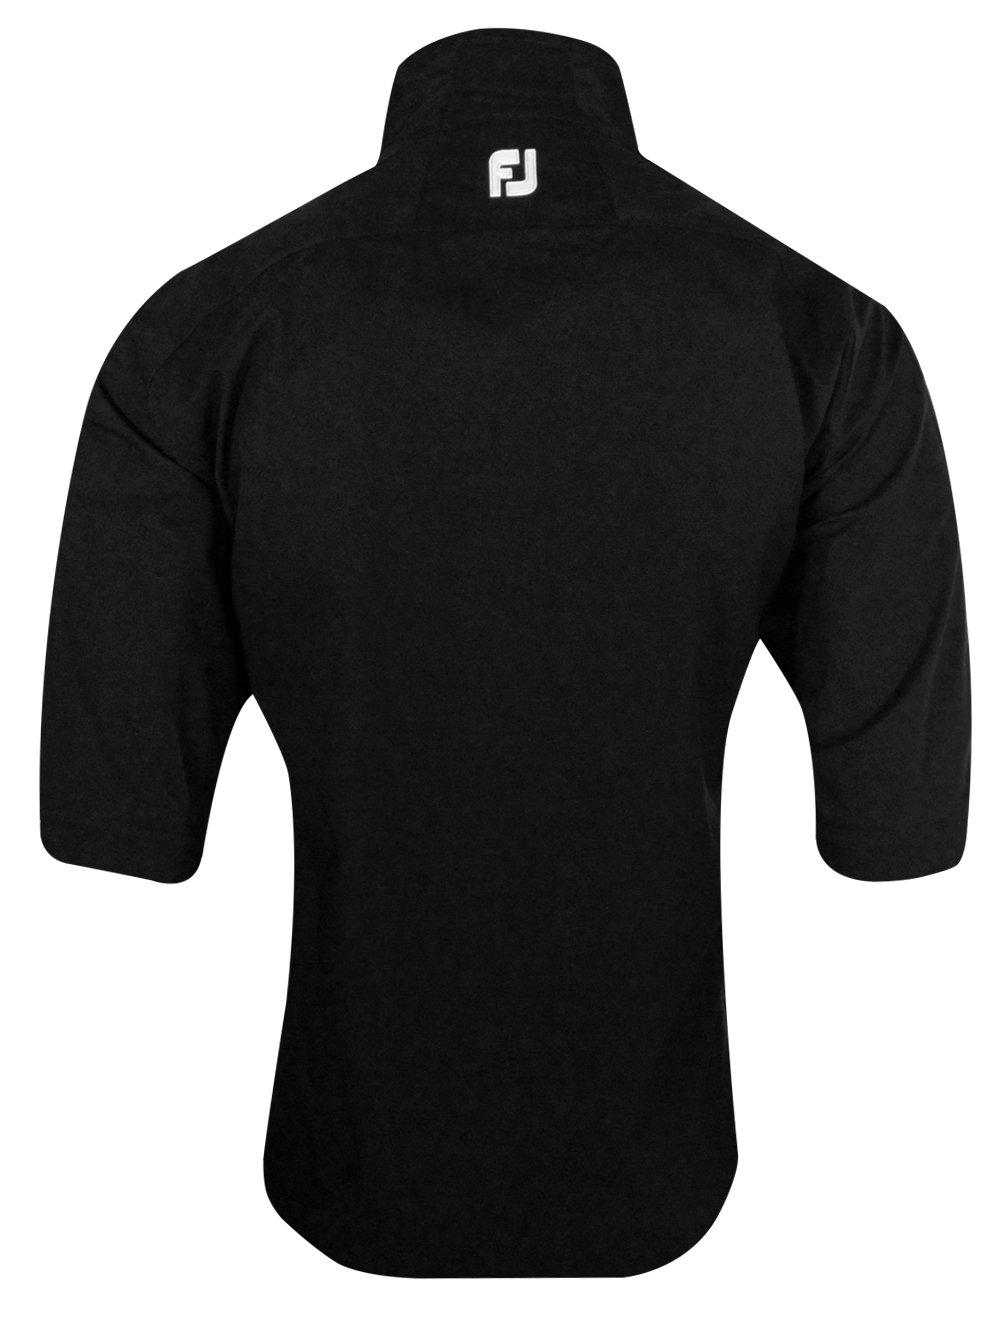 FootJoy DryJoys Hydrolite Short Sleeve Rain Shirt (Black, Medium)